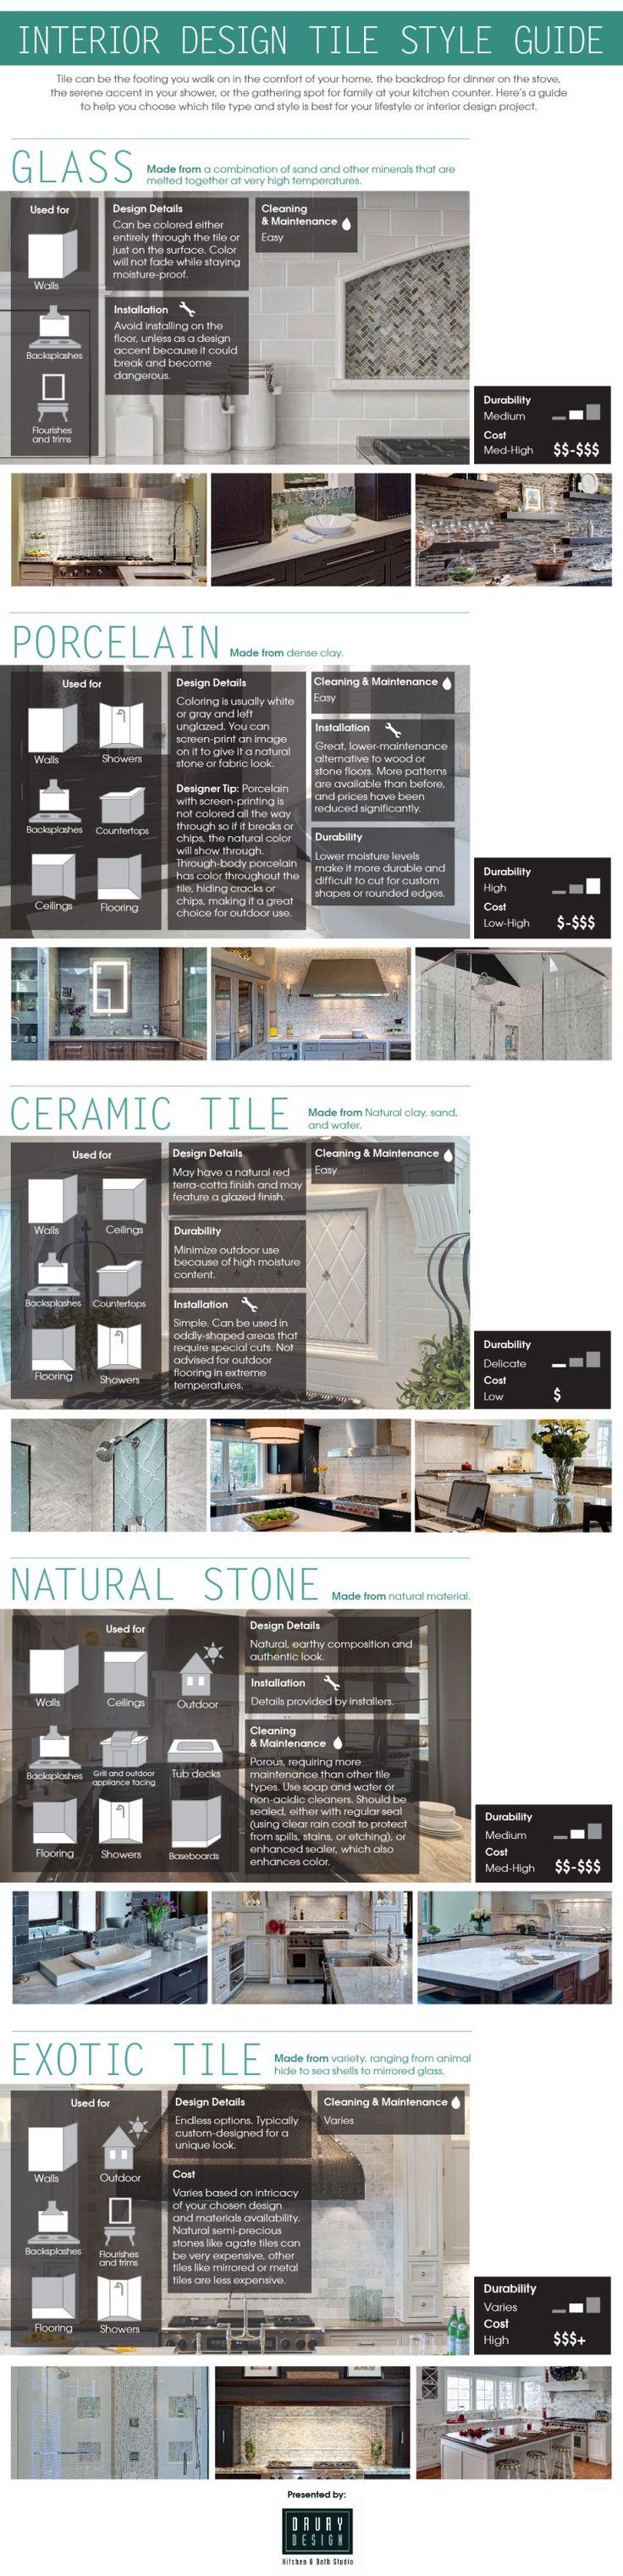 Best 25 Interior Design Studio Ideas On Pinterest Interior Design Office Space Interior